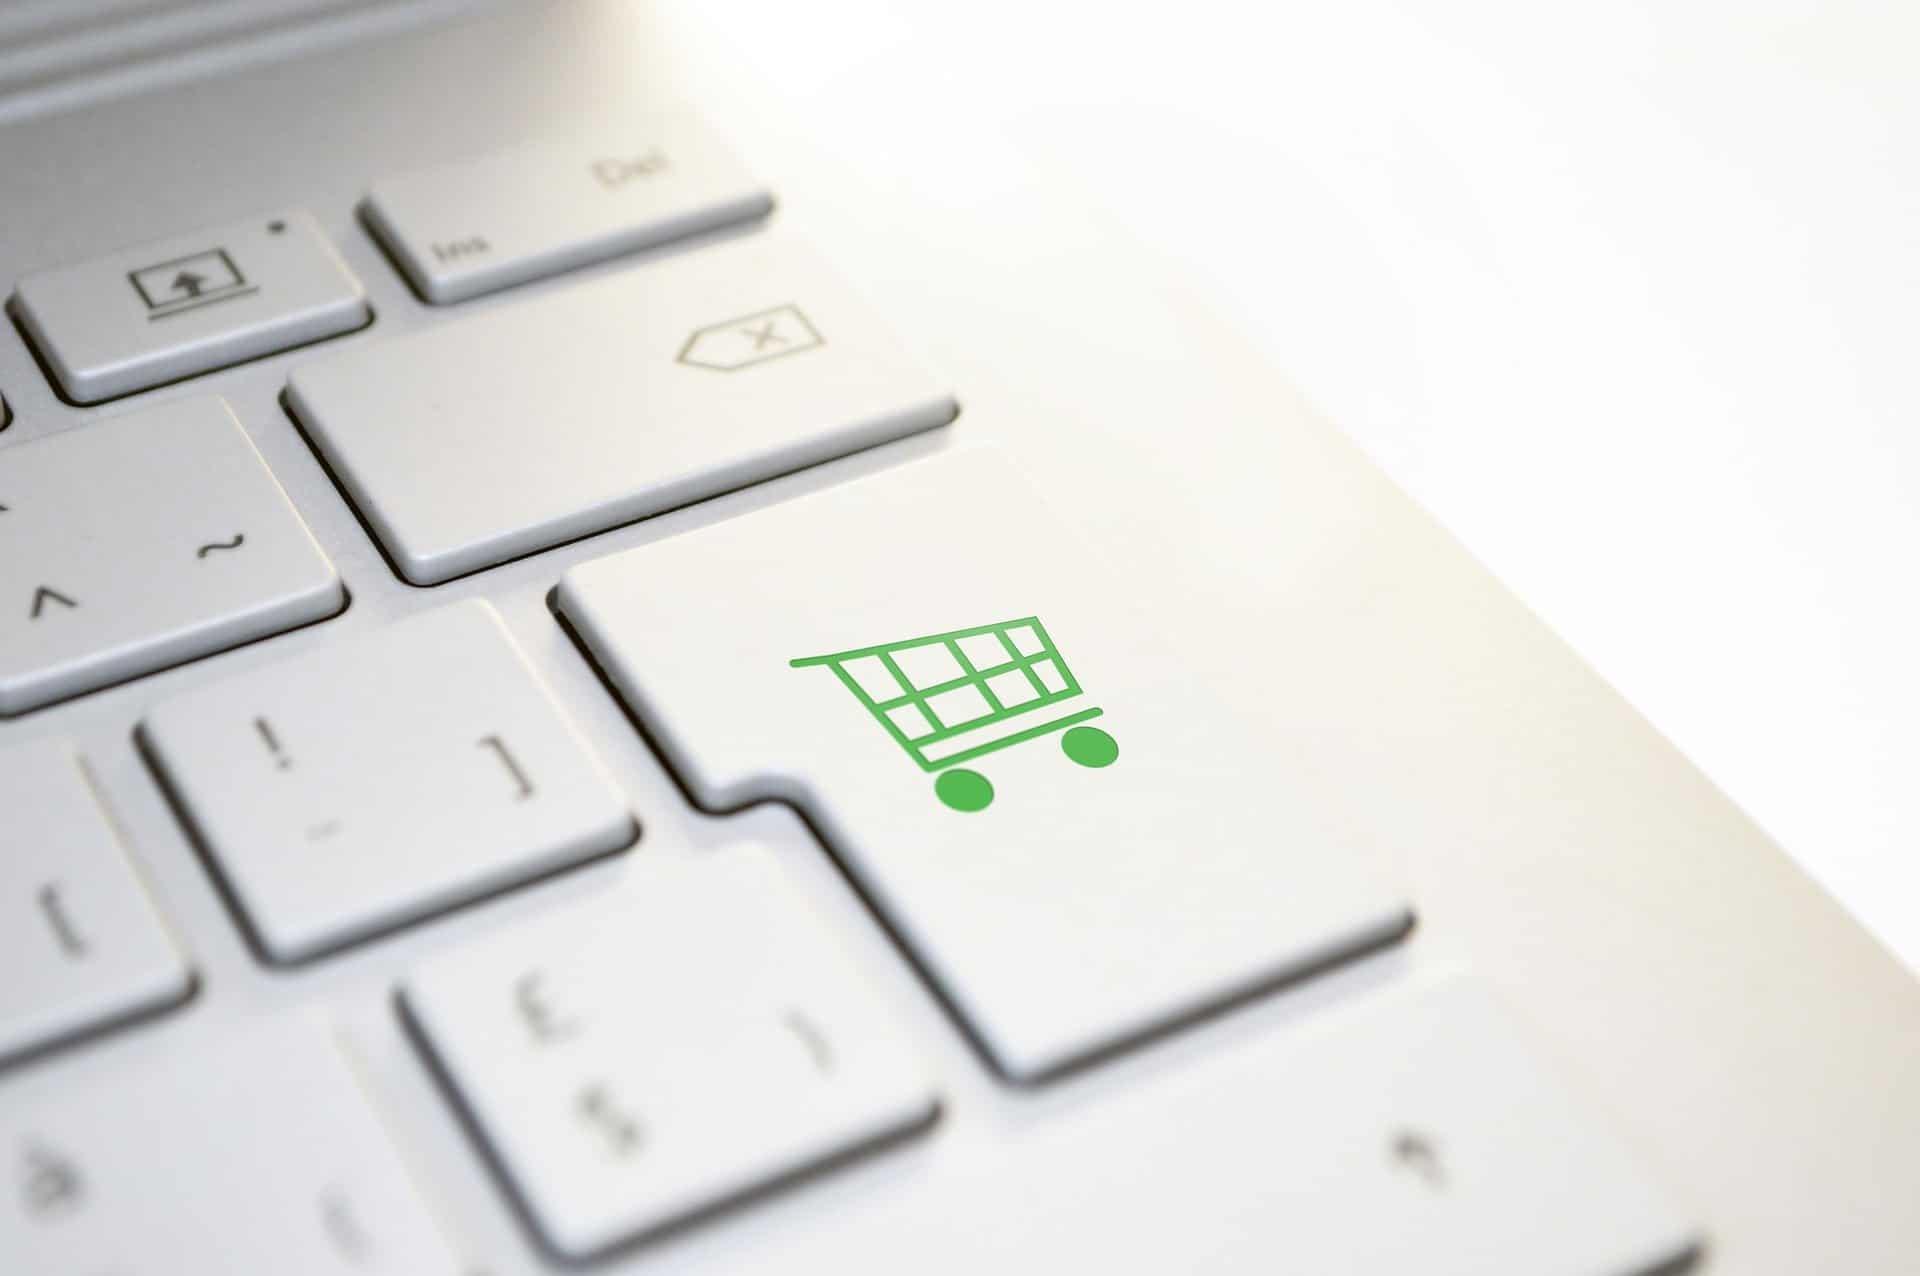 Online Shopping T&Cs Customers Beware